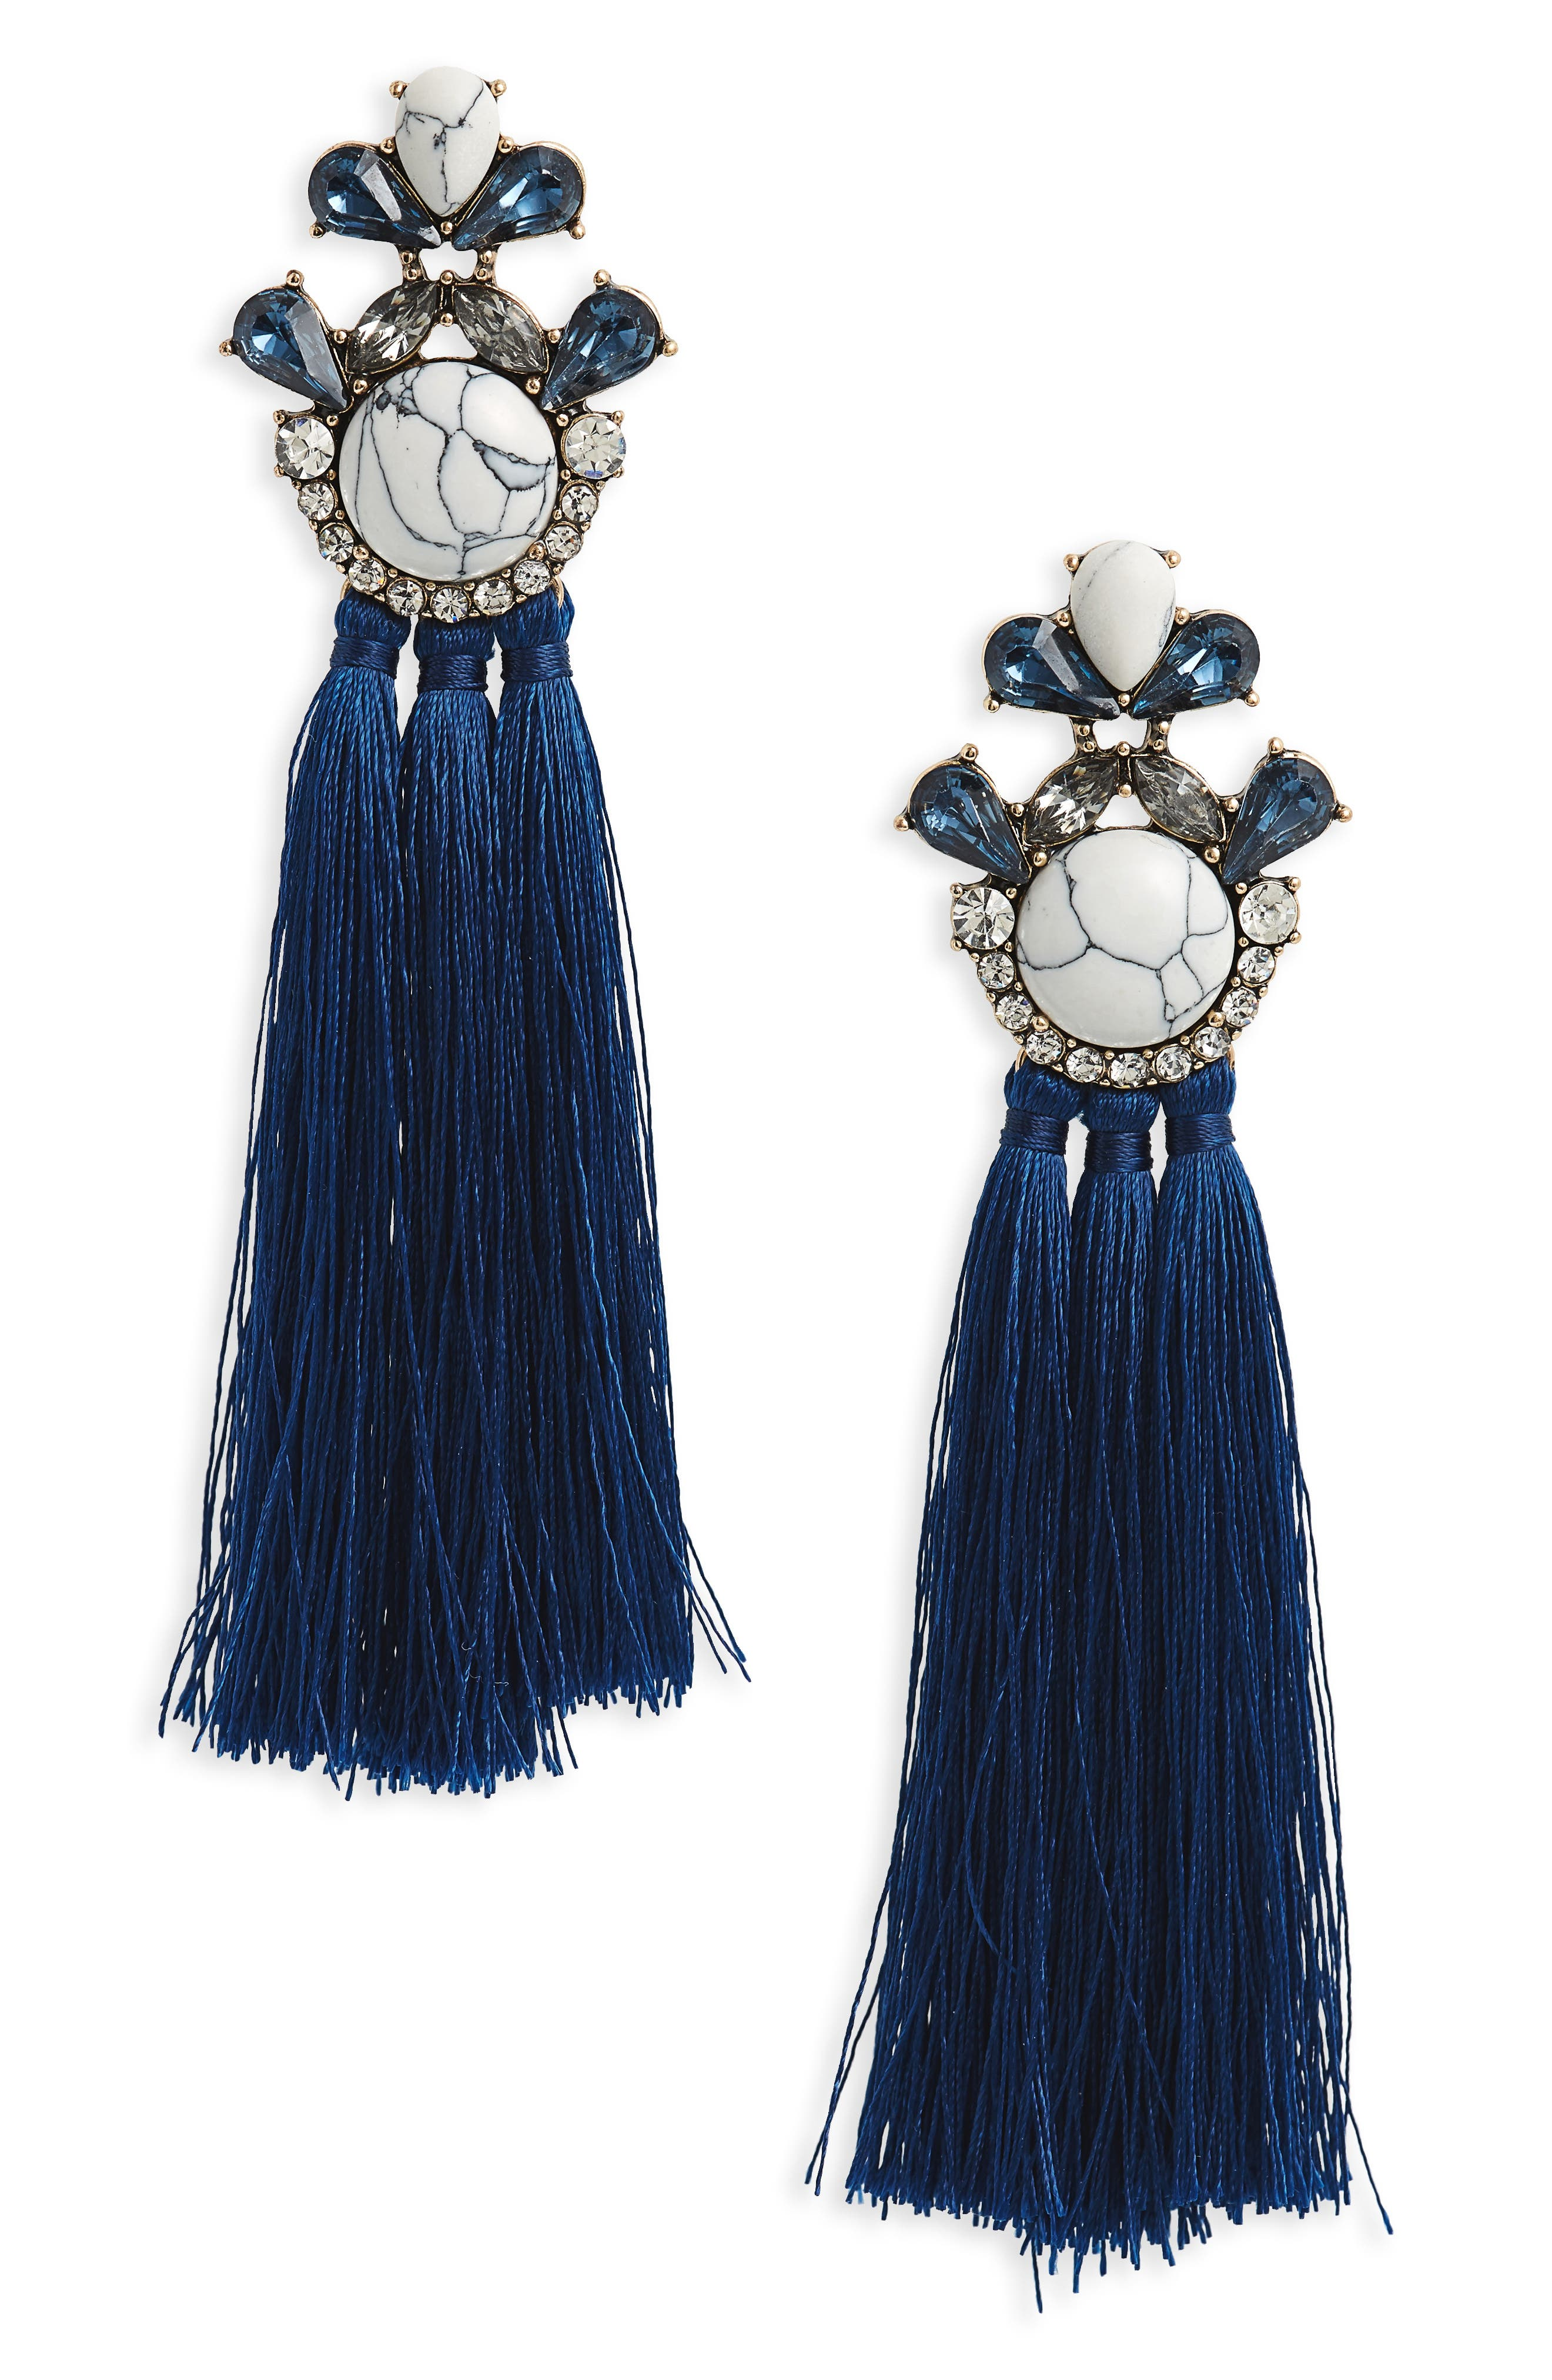 Marble & Crystal Tassel Earrings,                             Main thumbnail 1, color,                             Marble/ Blue/ Crystal